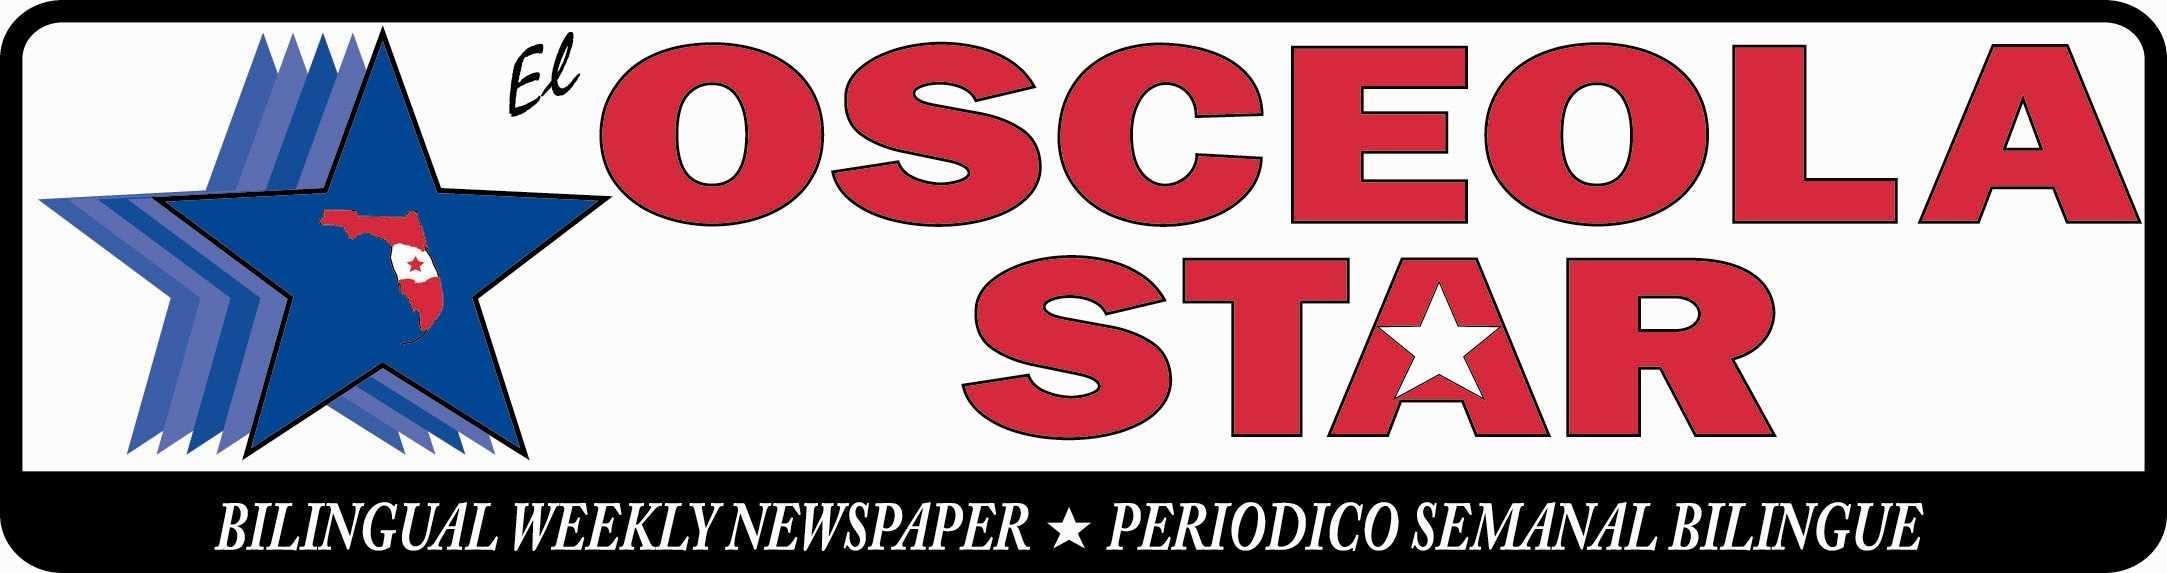 El Osceola Star